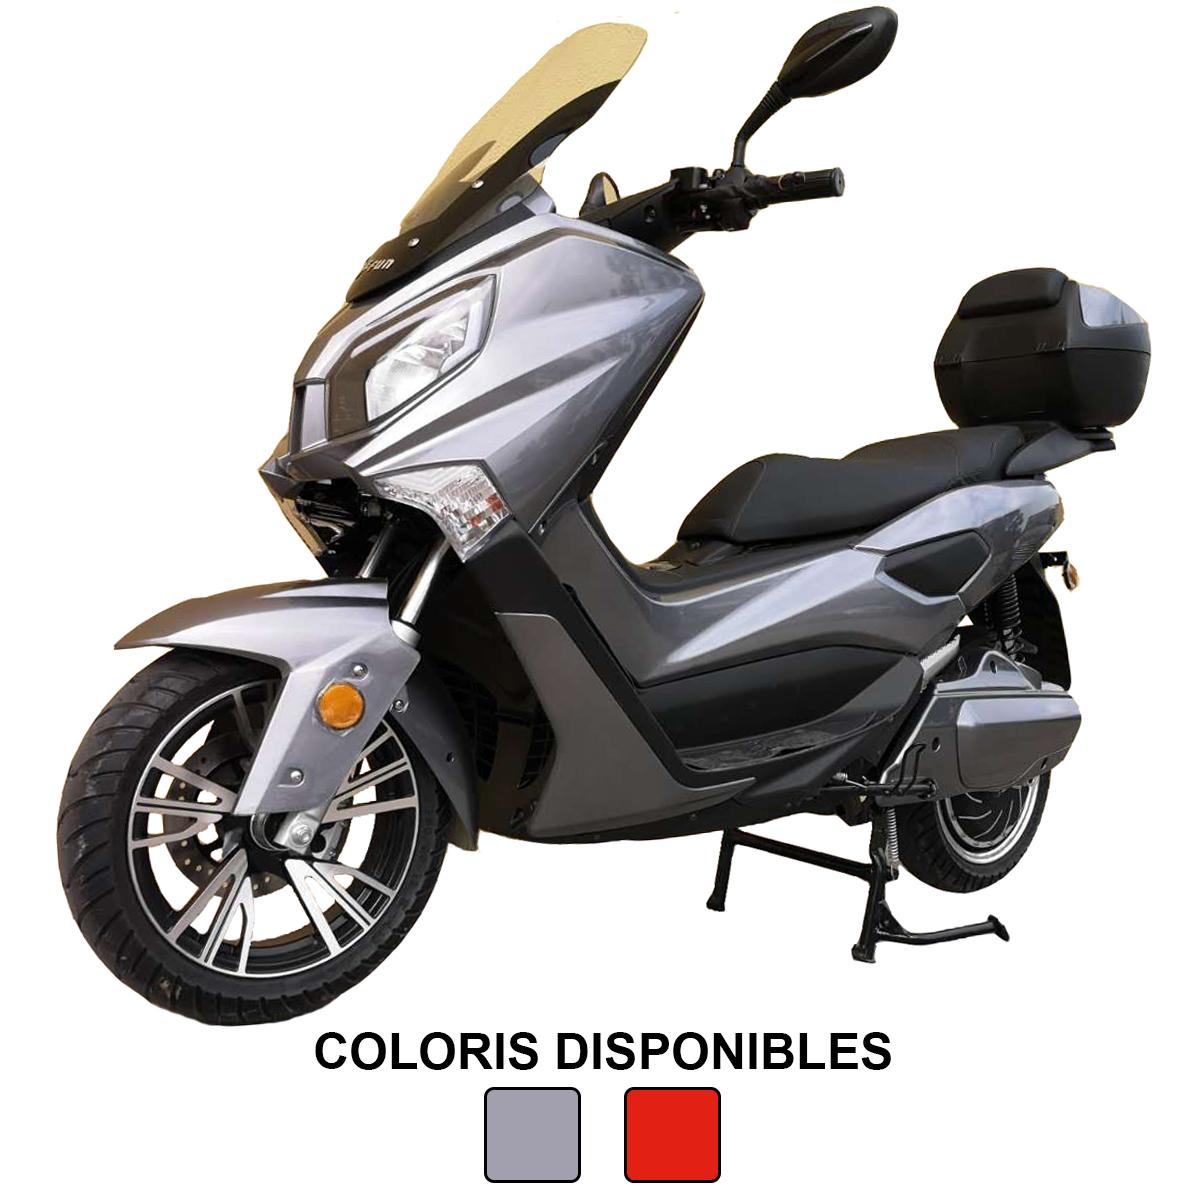 Scooter Lycke Tiger X - vitesse 115km/h et 150 KM d\'autonomie